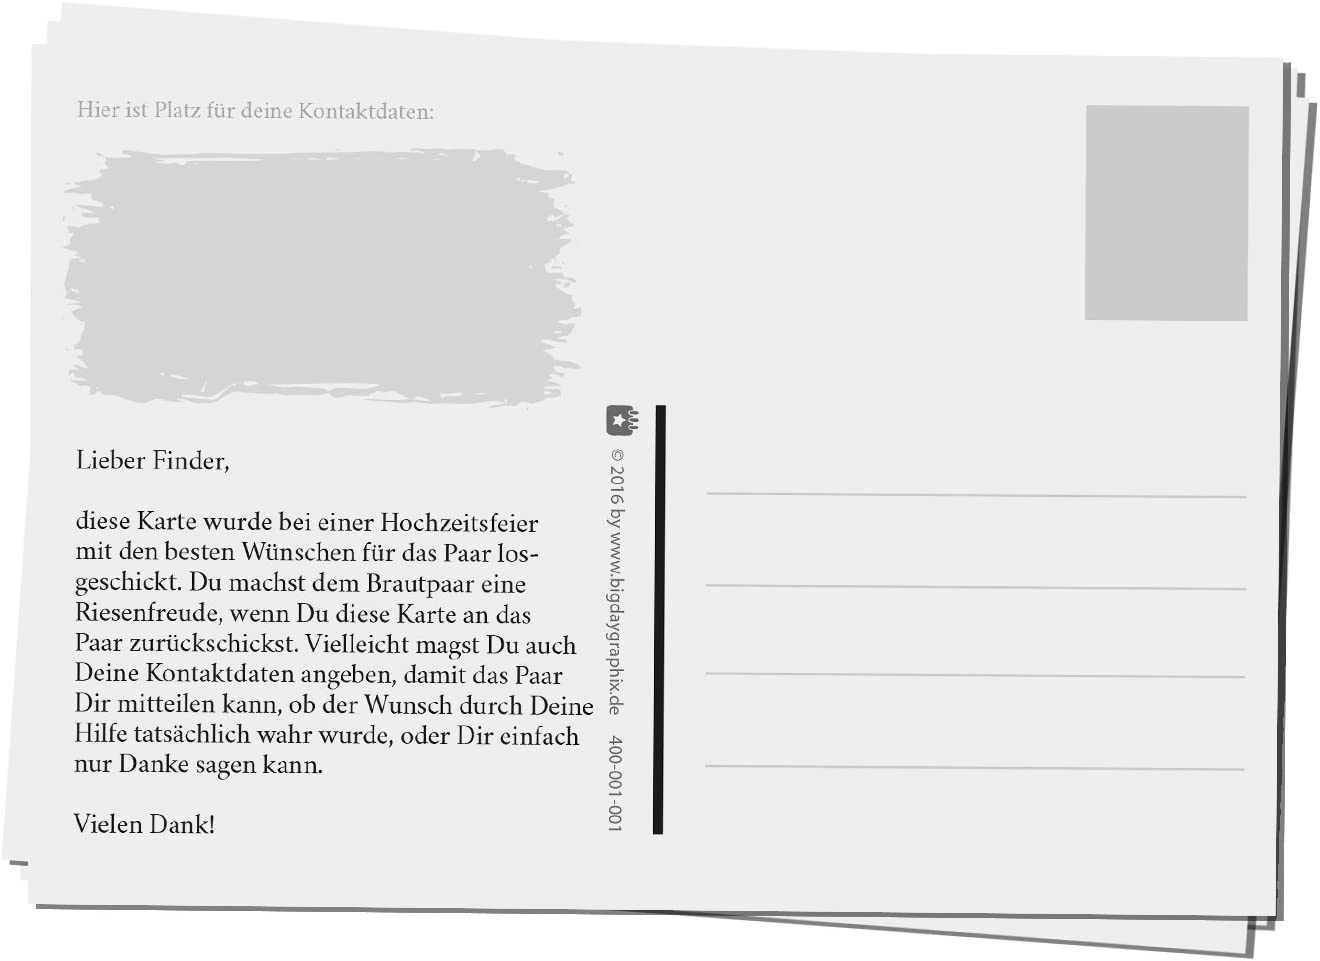 bigdaygraphix 50 Ballonflug-Karten Hochzeits-Karten Hochzeitsspiel extra leicht A6 Ballon Karten Holzoptik rustikal Blackwood mint